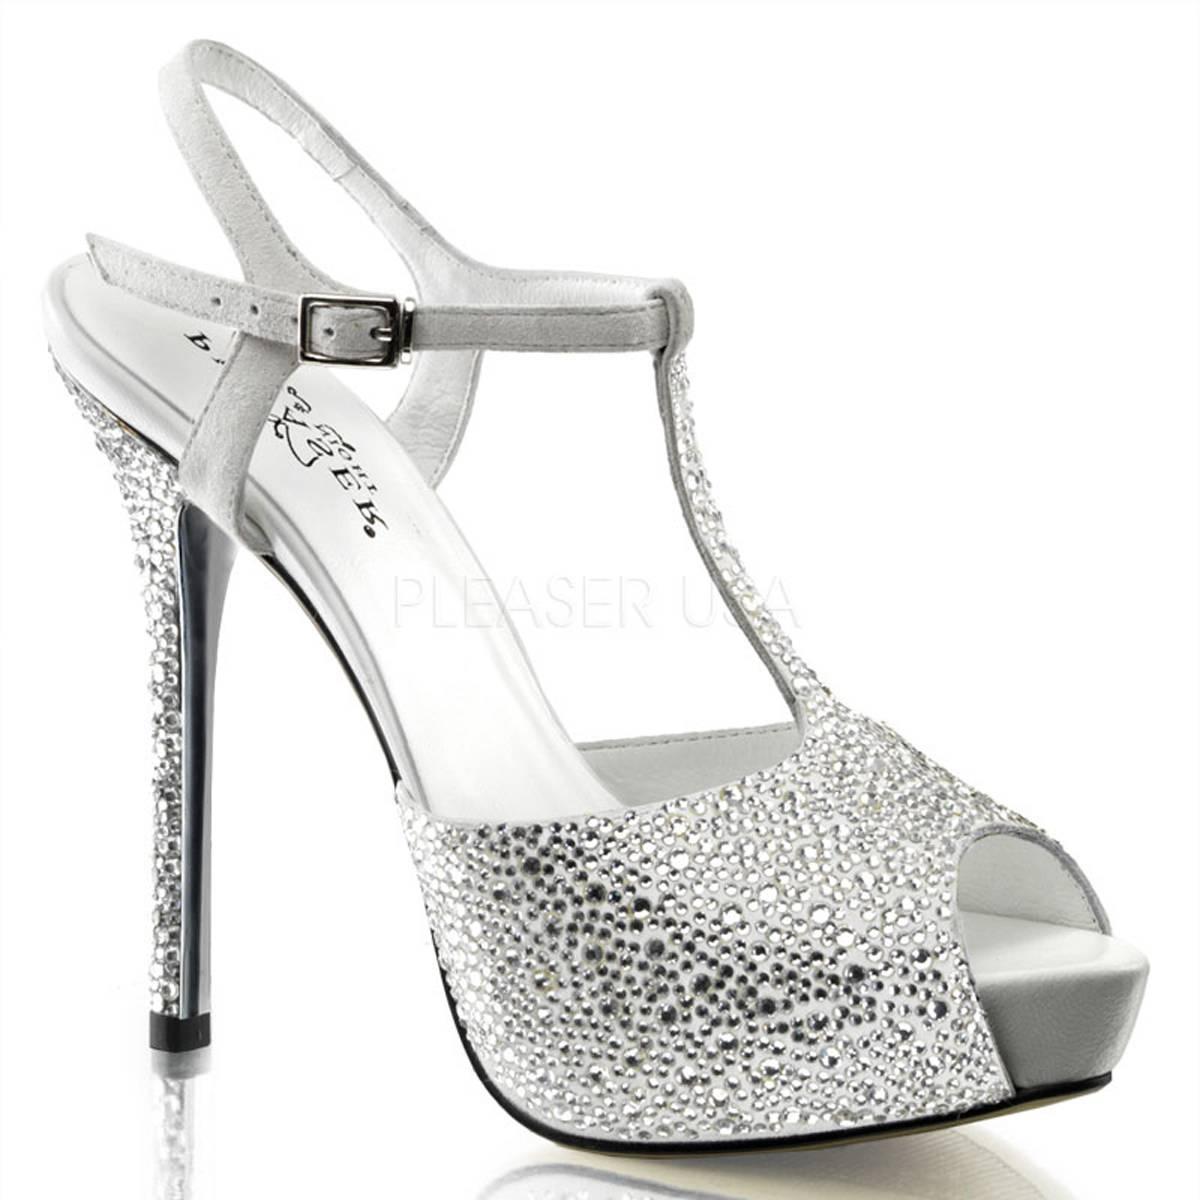 6307765f048166 PRESTIGE 10 ° Damen Peep Toe Sandalette ° Weiß Silber Leder ° Pleaser Day    Night